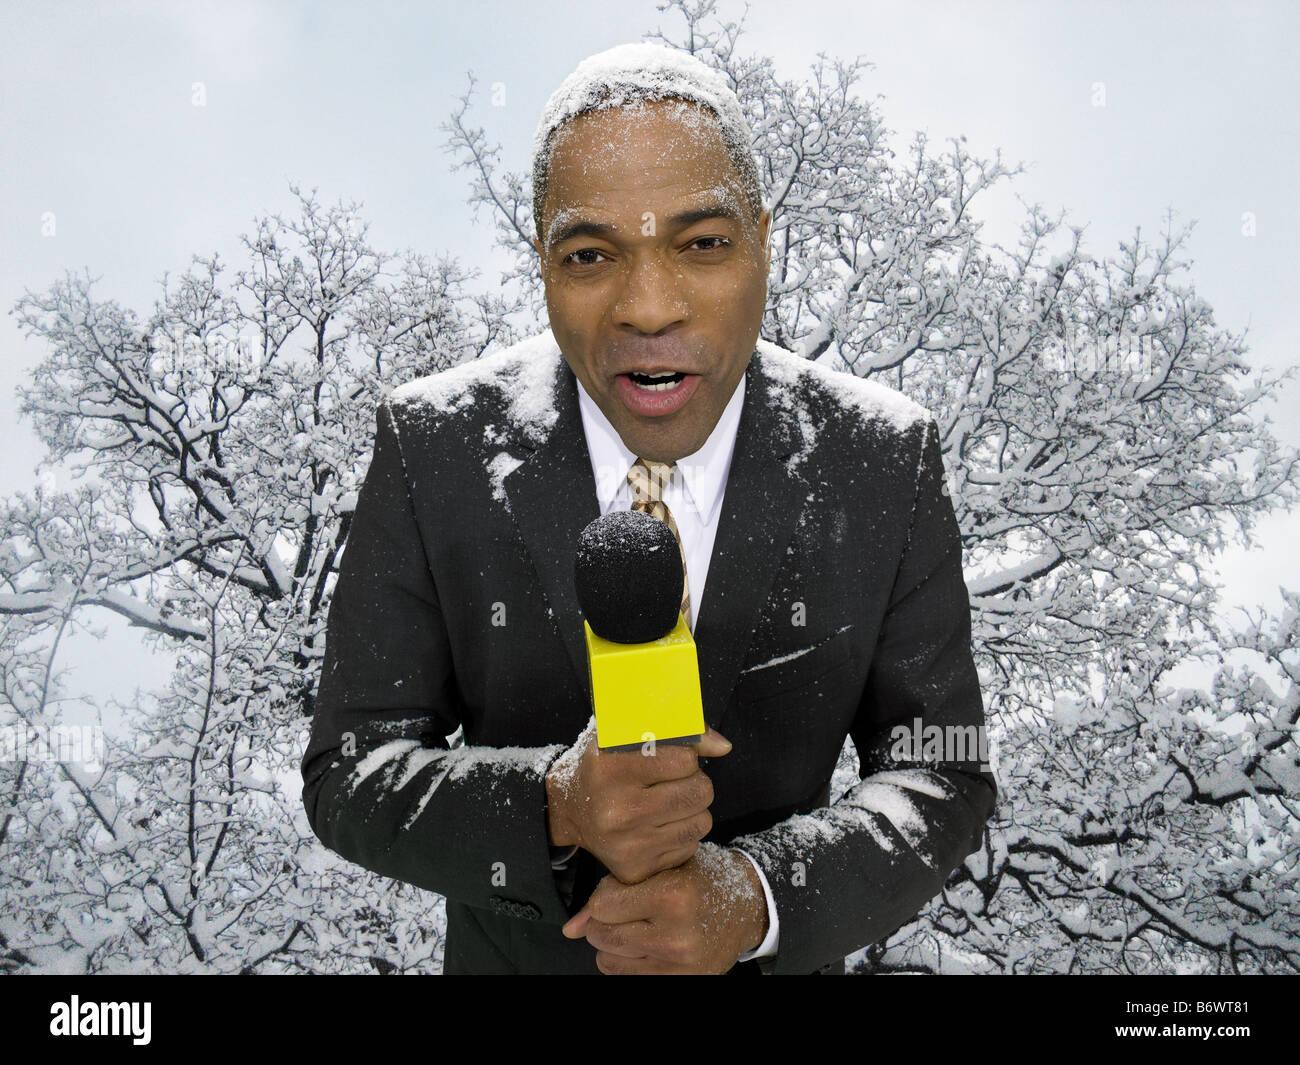 News presenter in snow - Stock Image